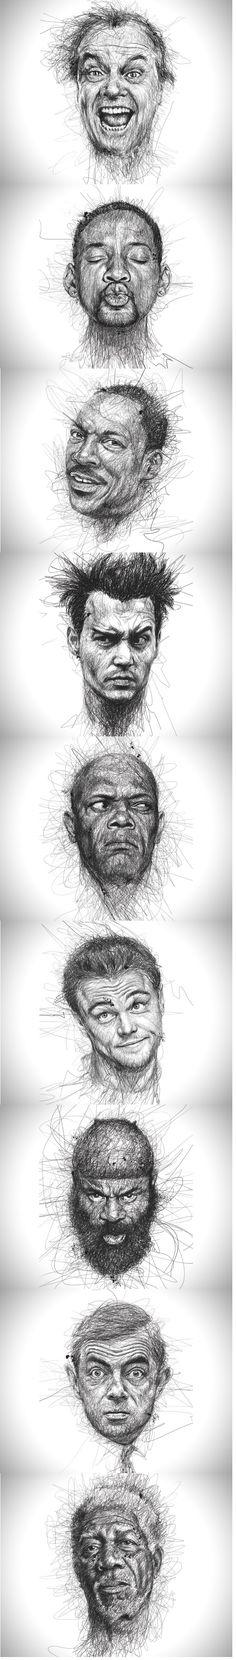 Line Drawings Of Facial Expressions : Angry tiger face Сток иллюстраторы с которых брать